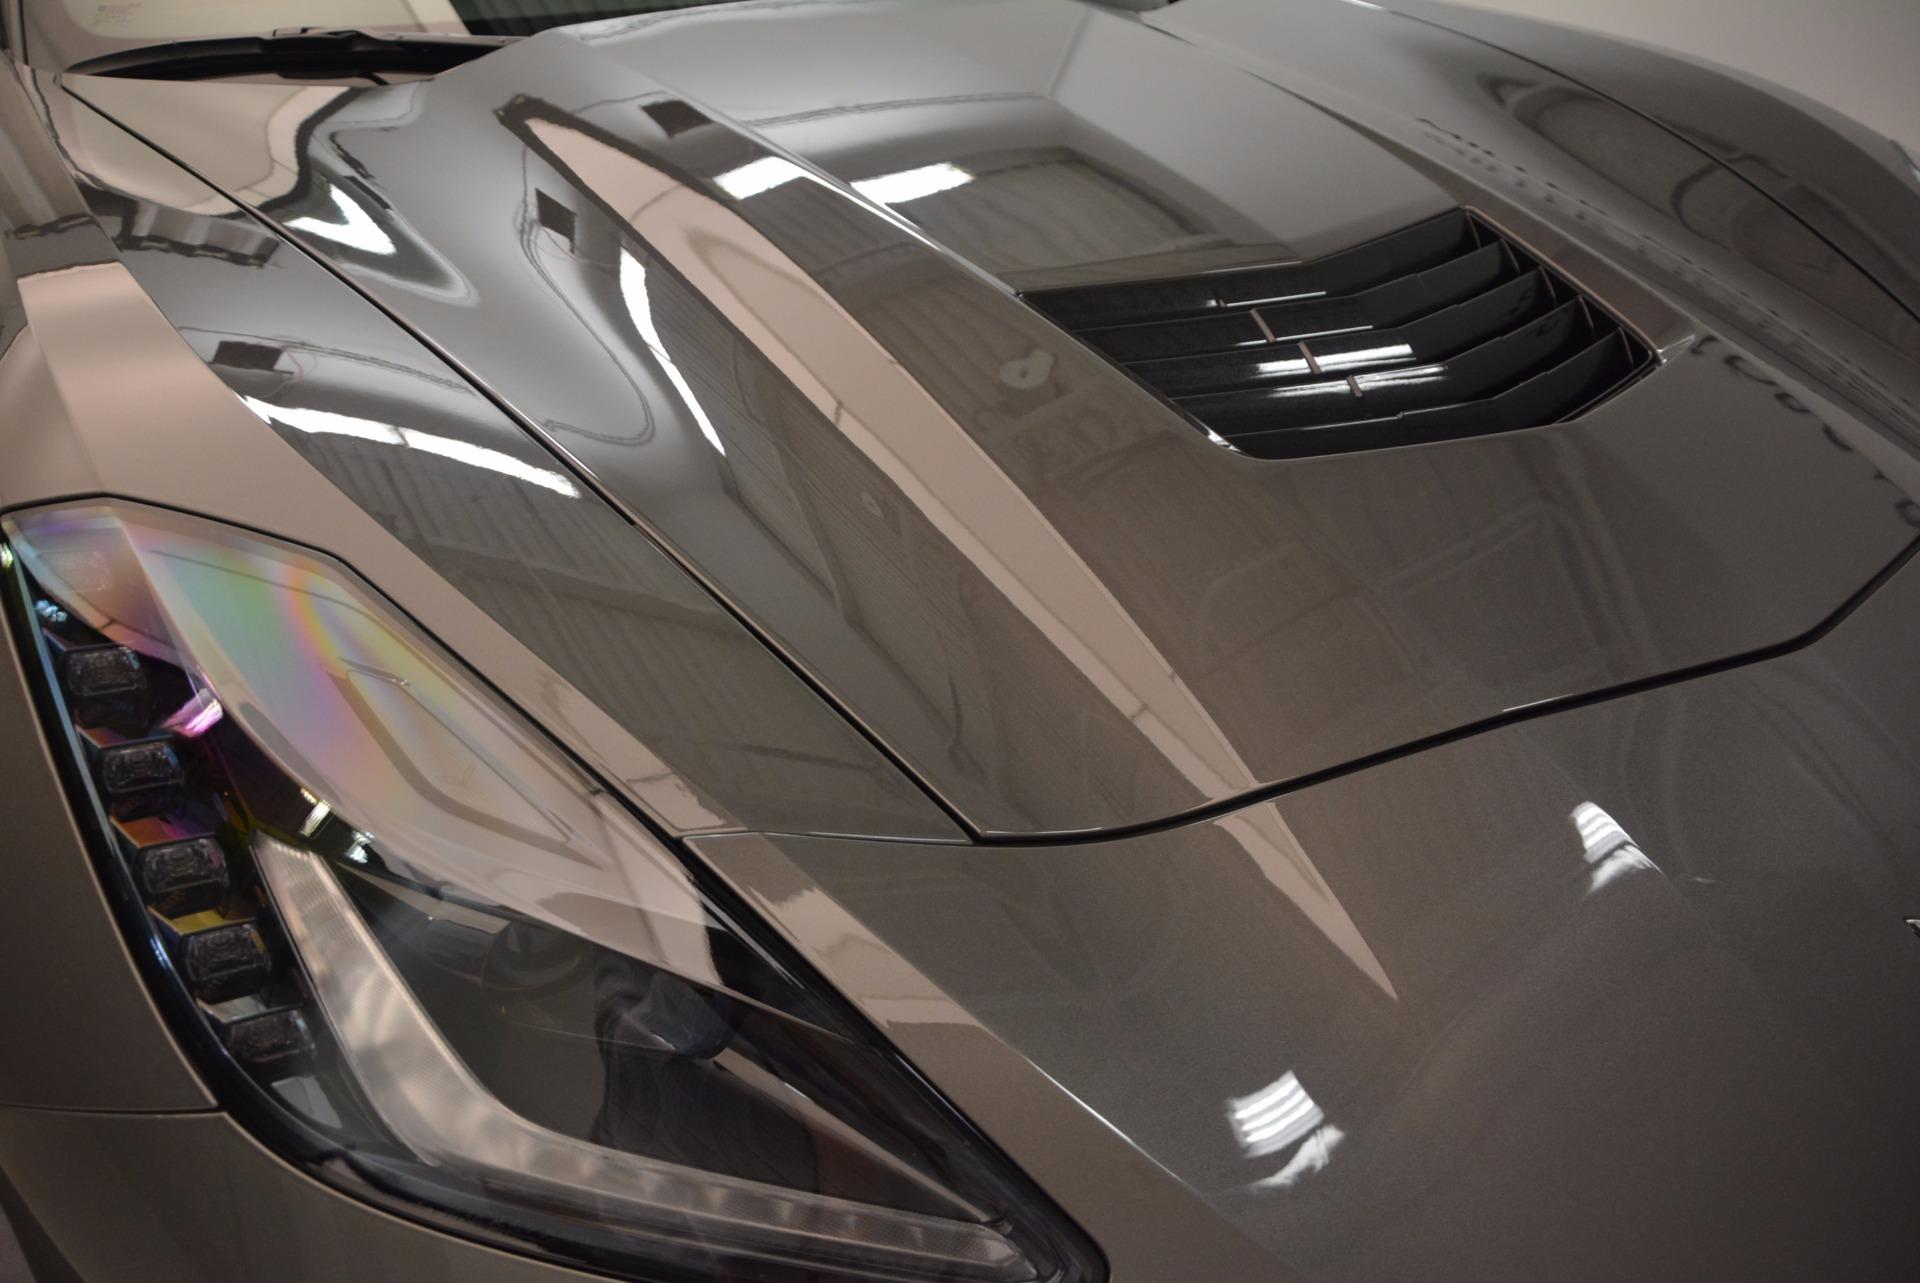 Used 2015 Chevrolet Corvette Stingray Z51 For Sale 0 In Greenwich, CT